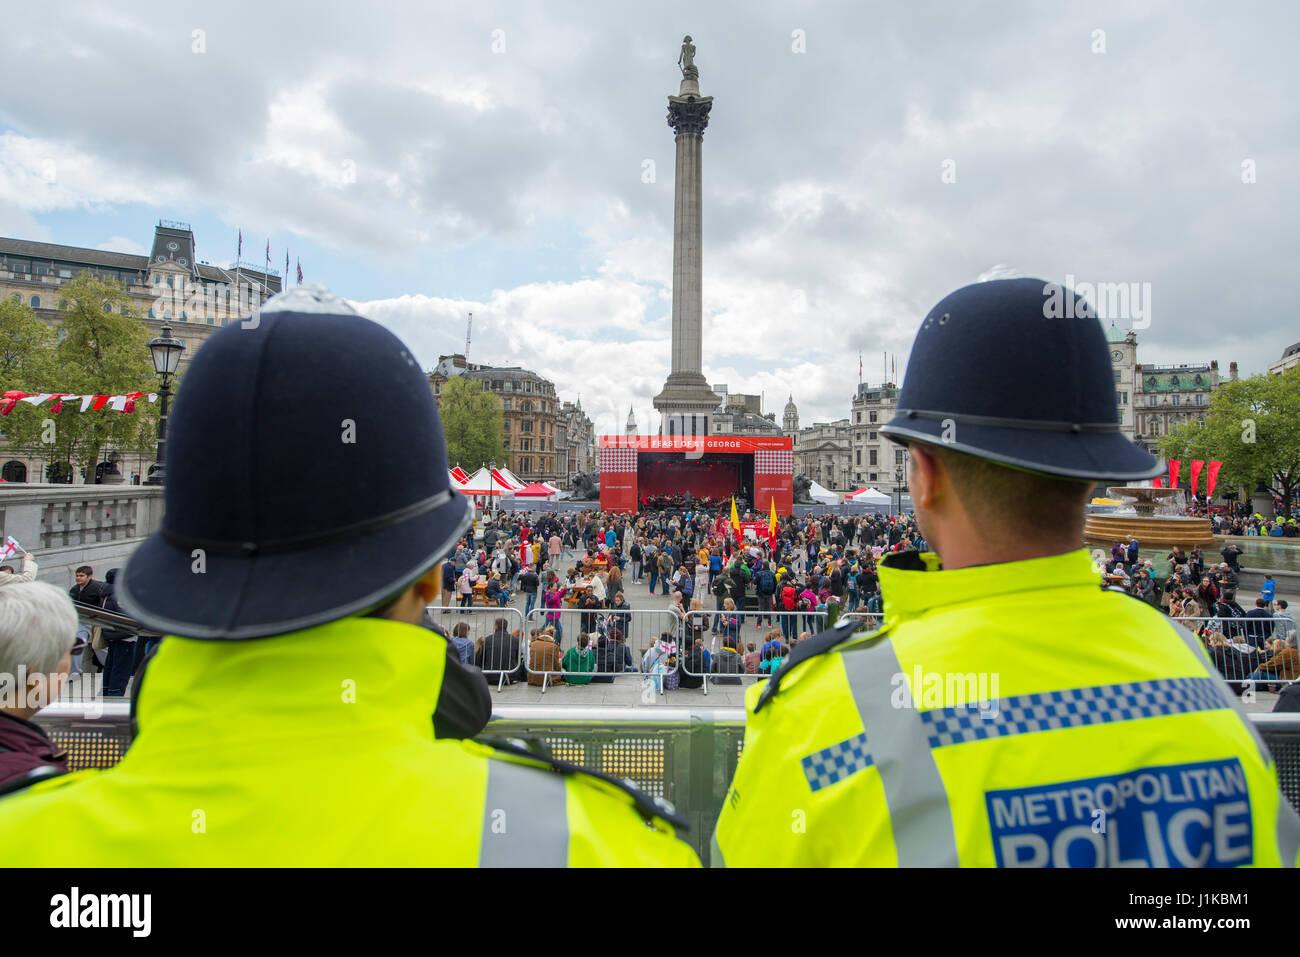 Trafalgar Square, London, UK. 22nd Apr, 2017. London celebrates St Georges Day at the Mayor of London's annual - Stock Image